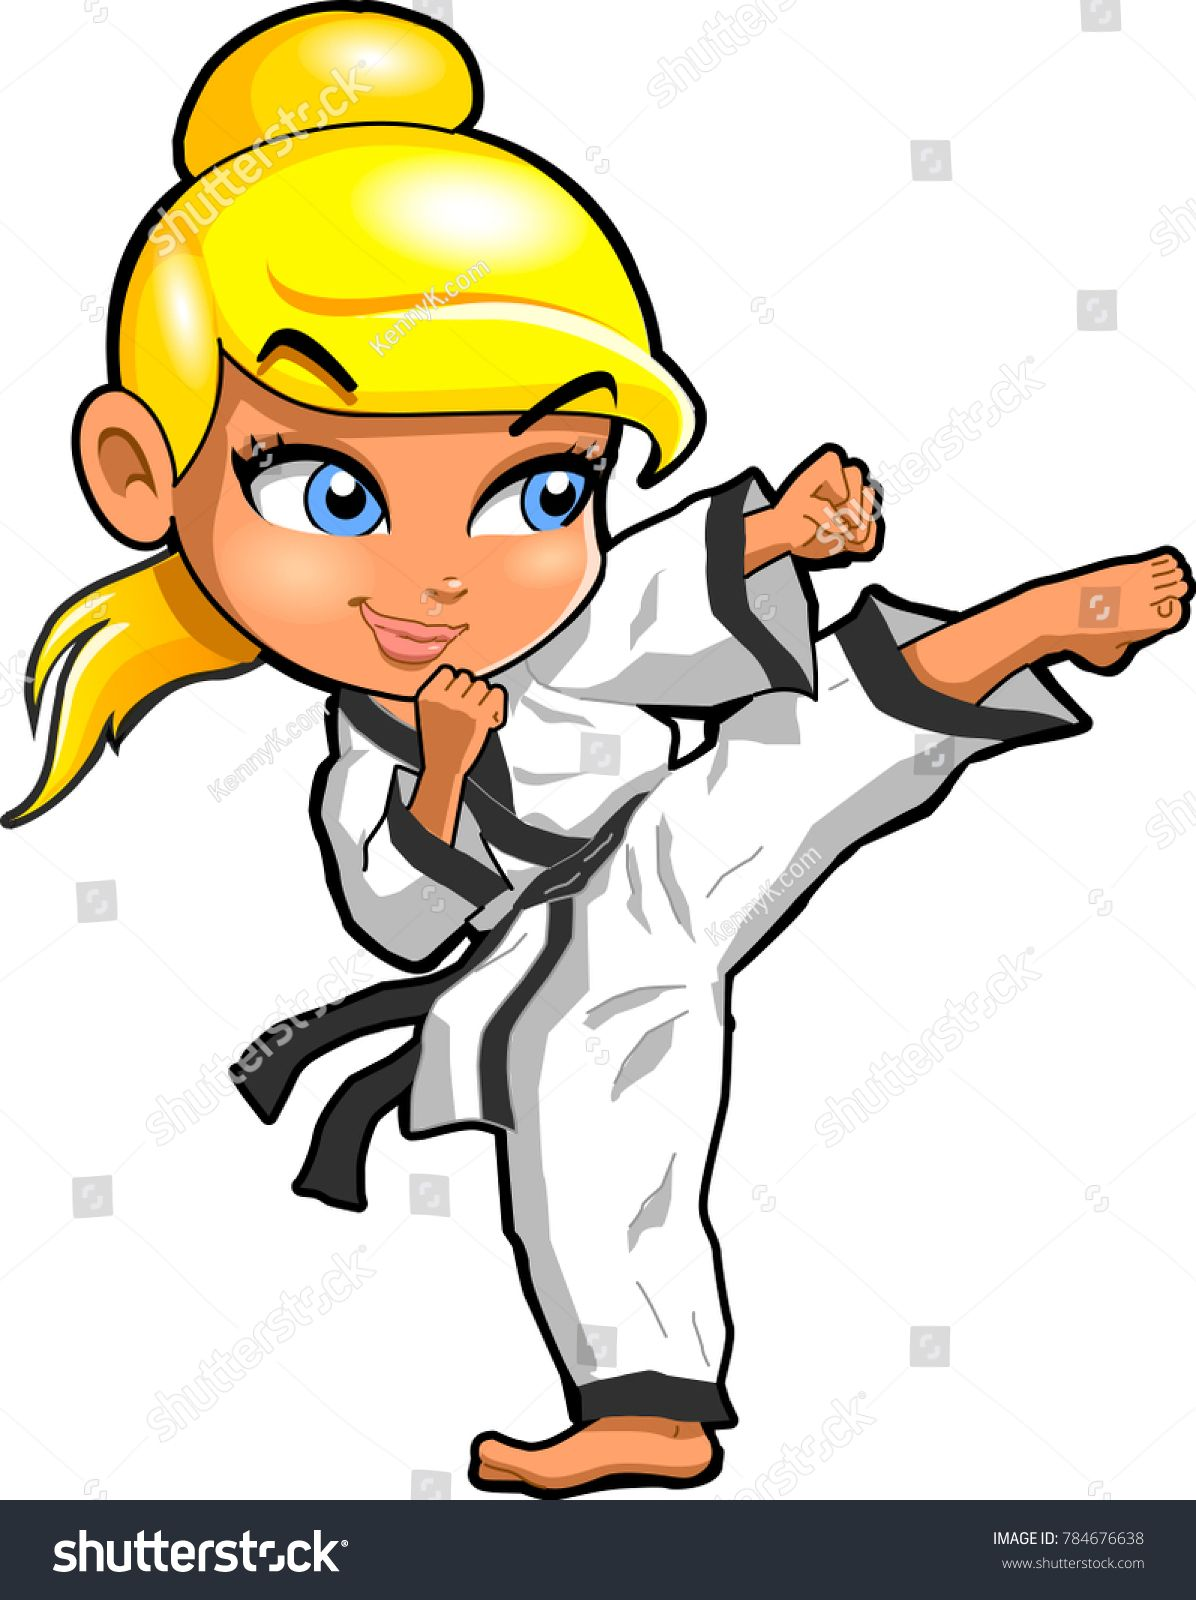 Karate martial arts tae kwon do dojo vector clipart cartoon.